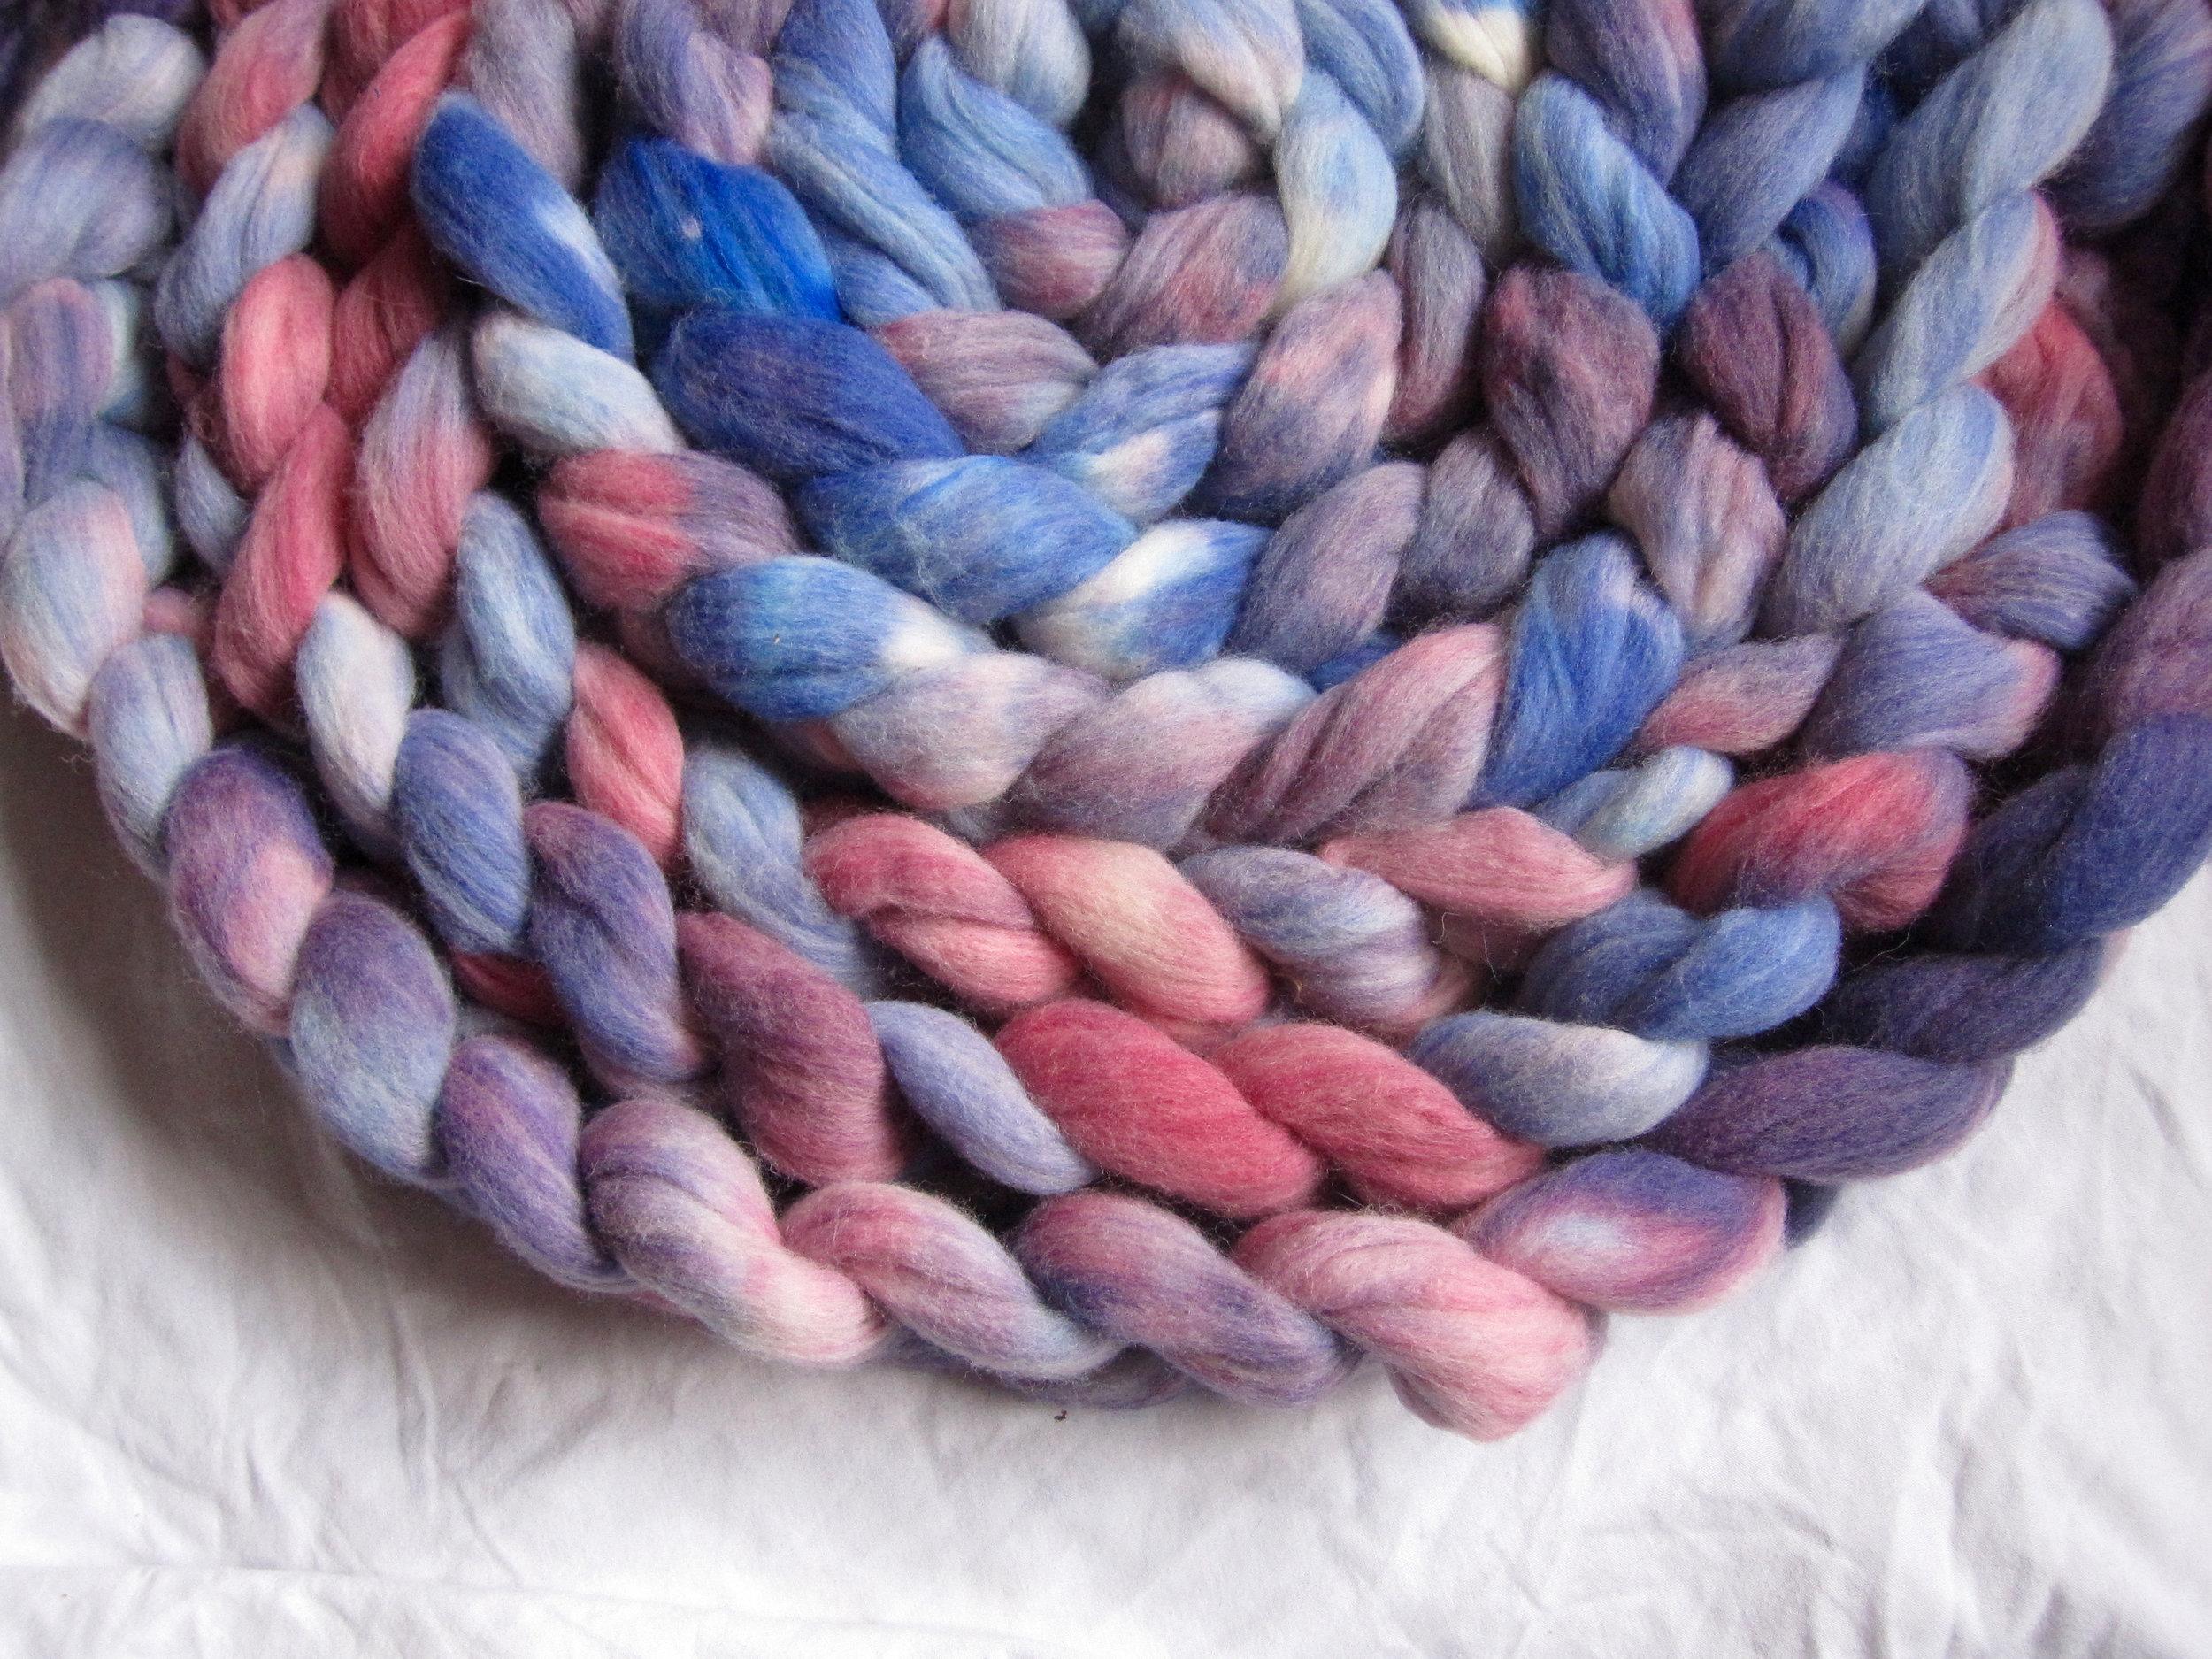 Network on my new Sock Blend (50% Corriedale/25% Southdown/25% nylon)